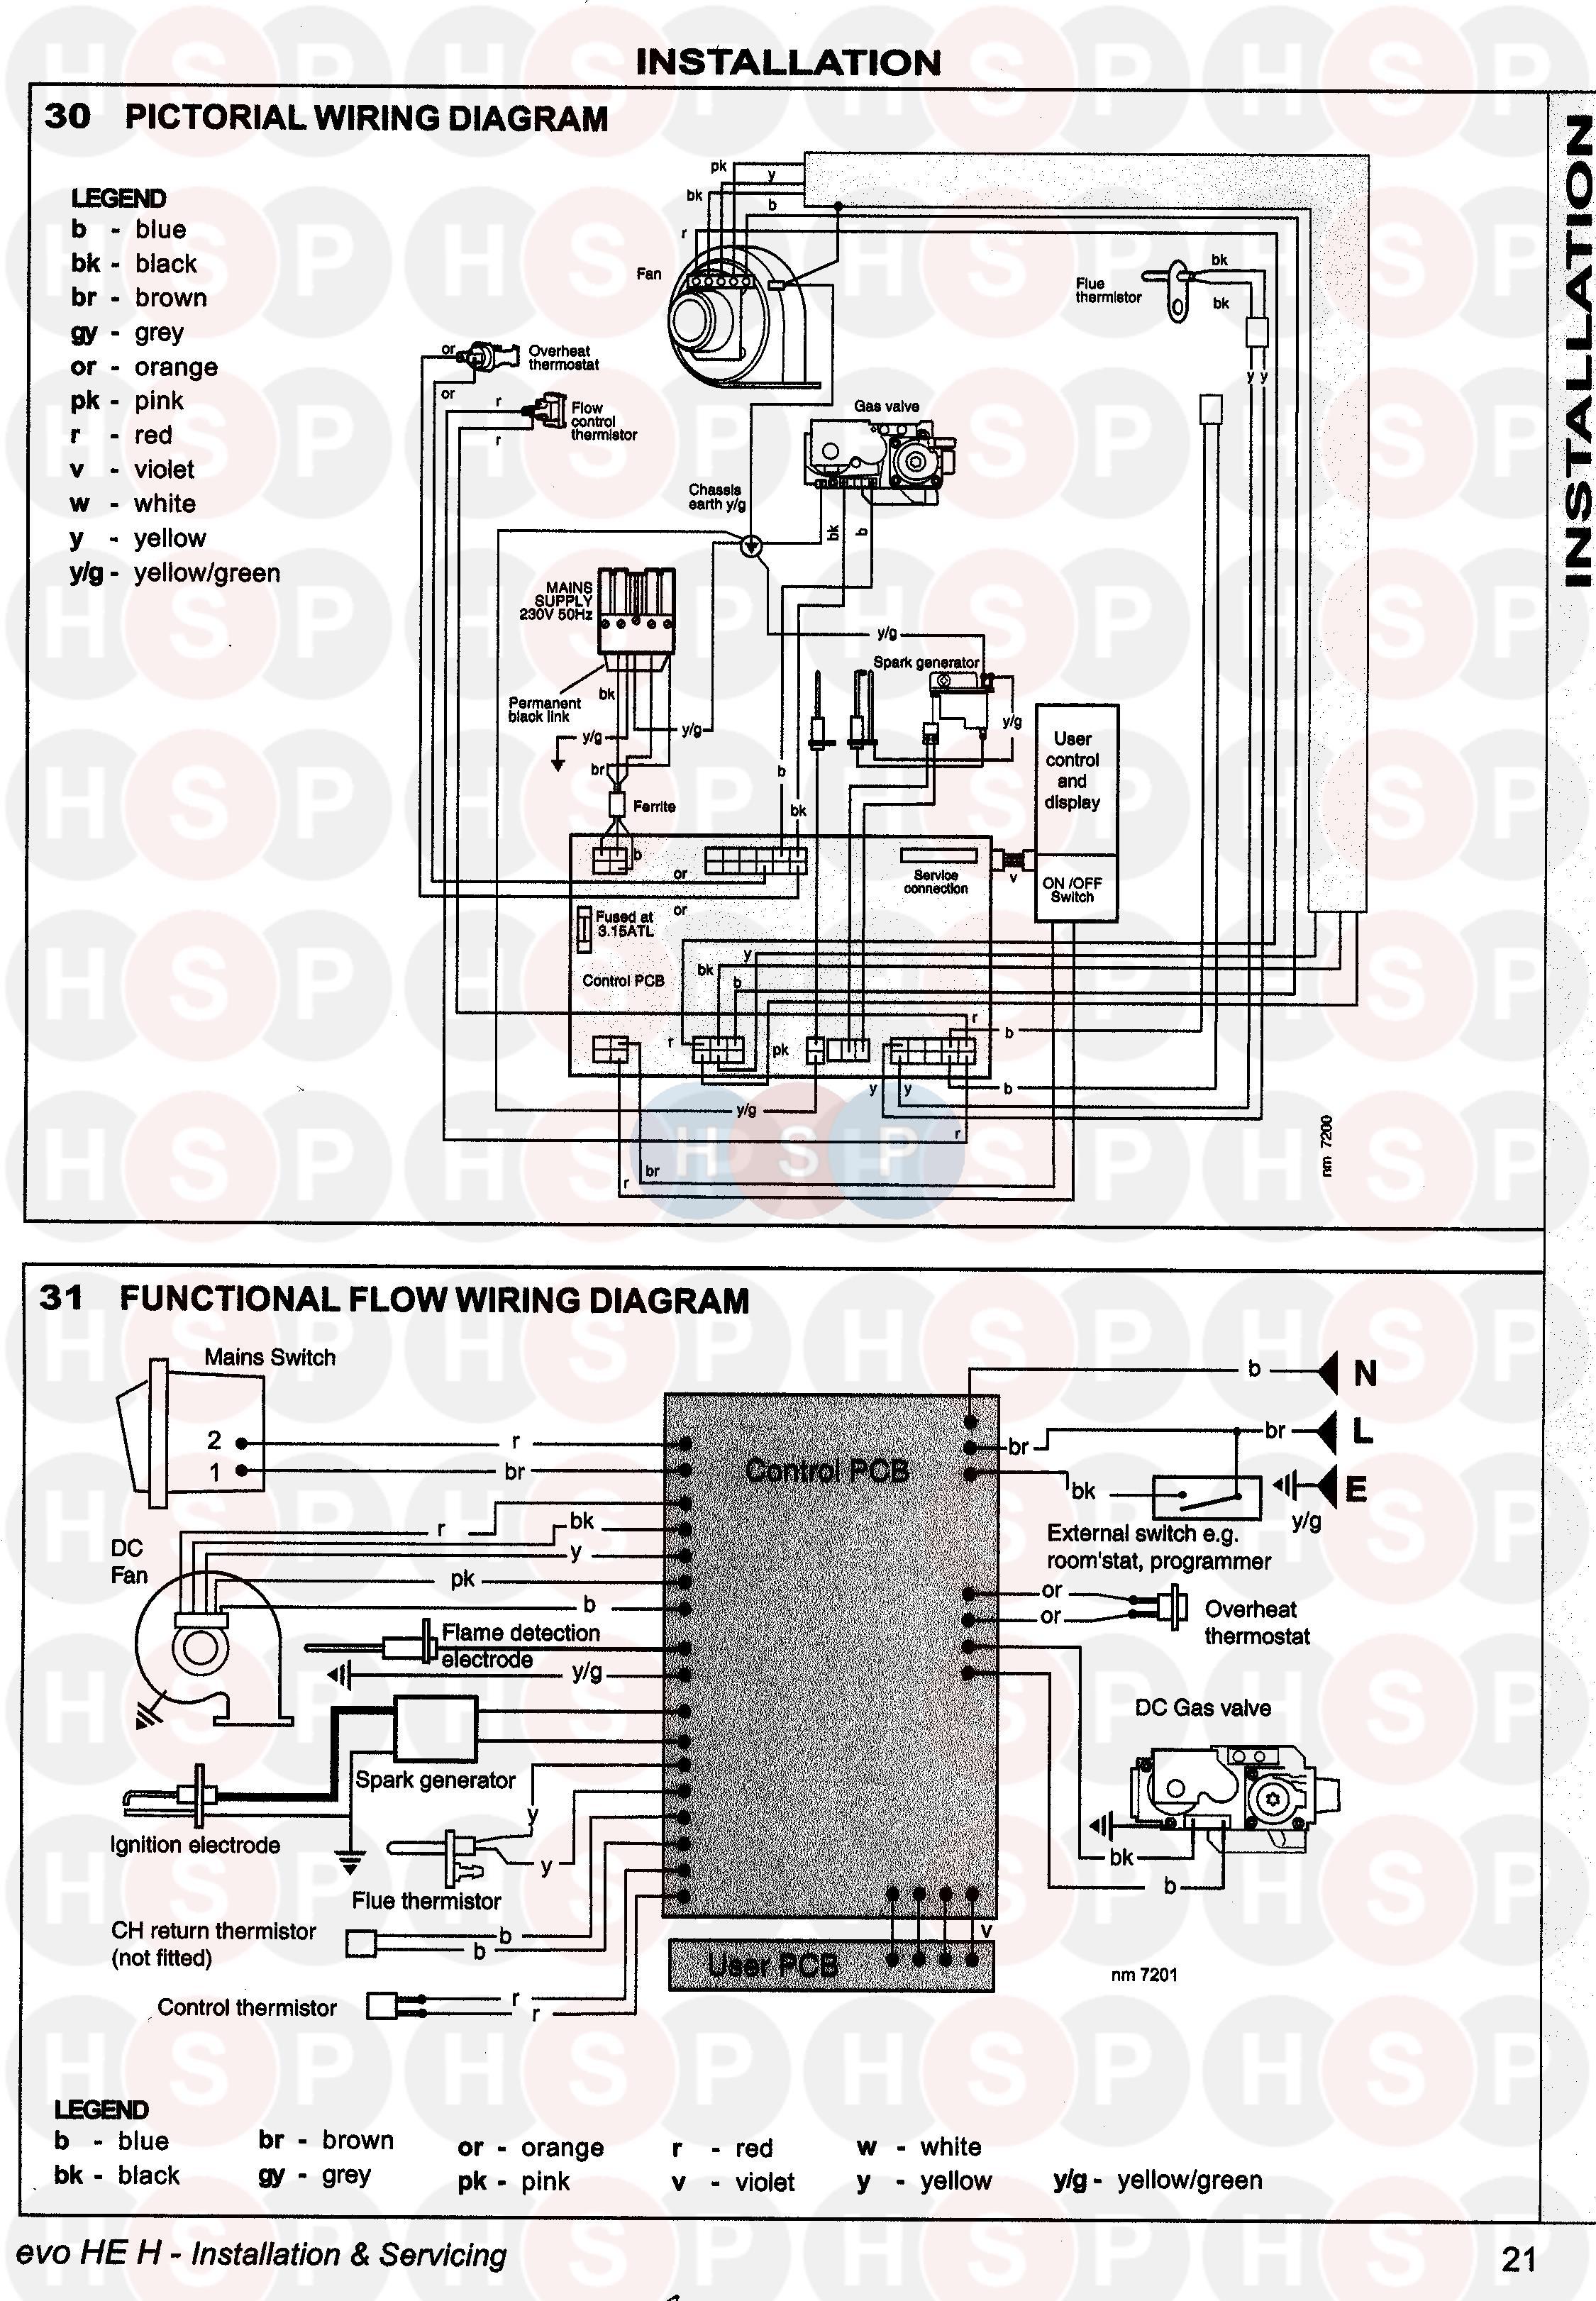 Ideal Evo He H16 Appliance Diagram  Wiring Diagram